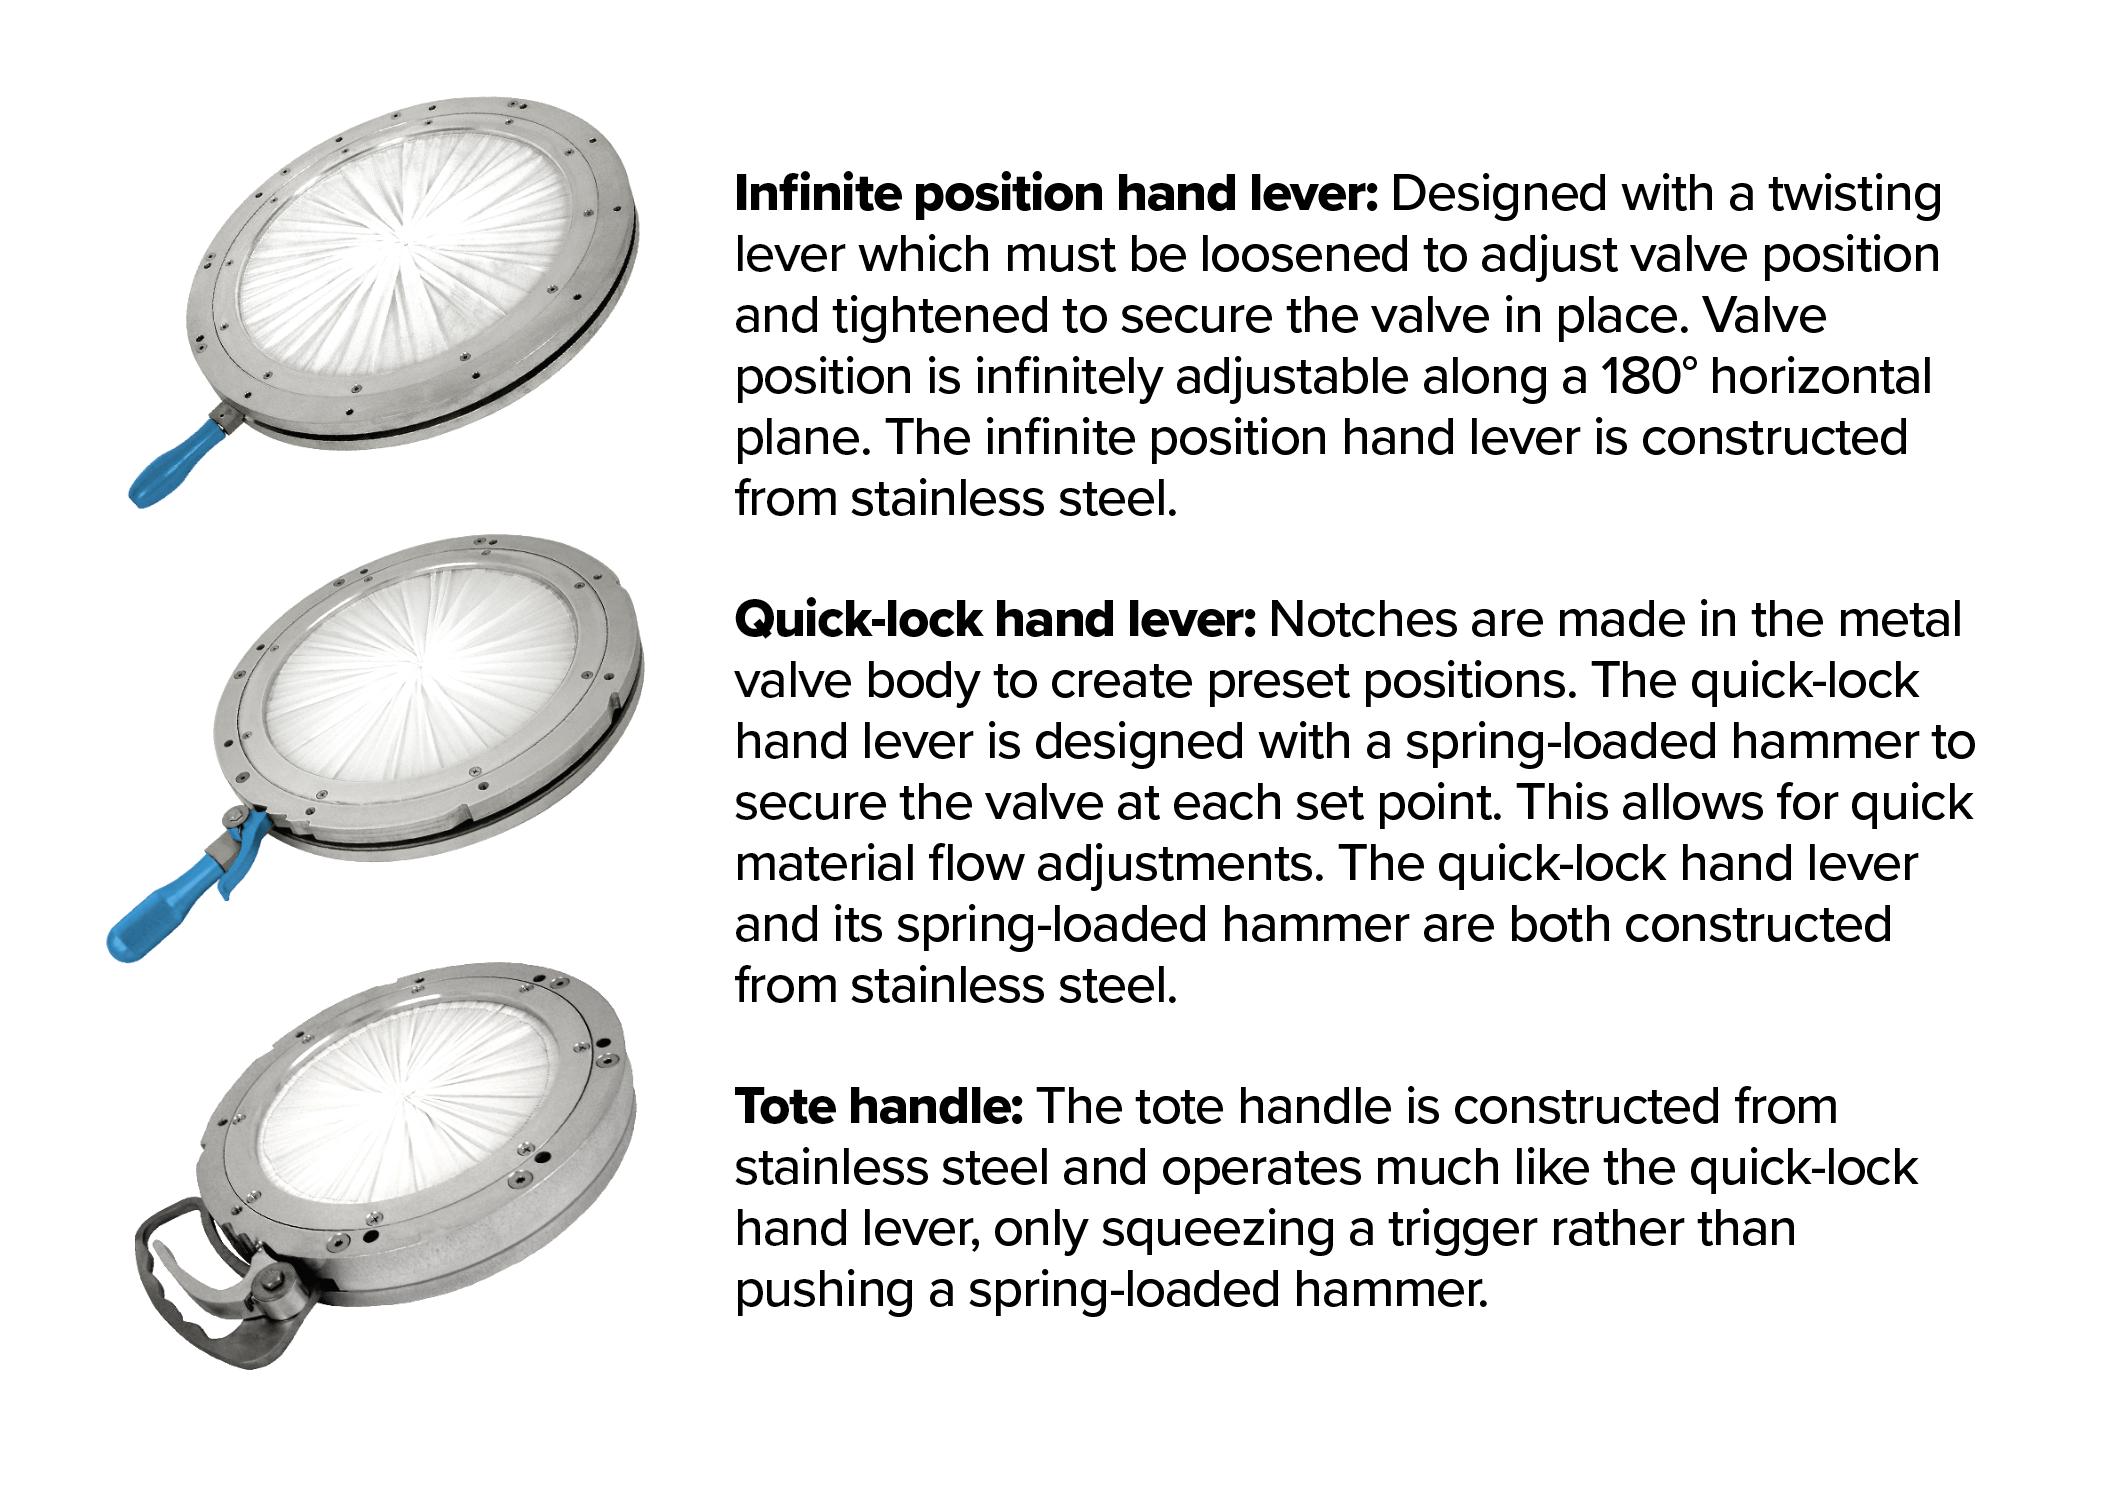 Iris Valve options. 1. Infinite position hand lever, 2. Quick-lock hand lever, 3. Tote handle.